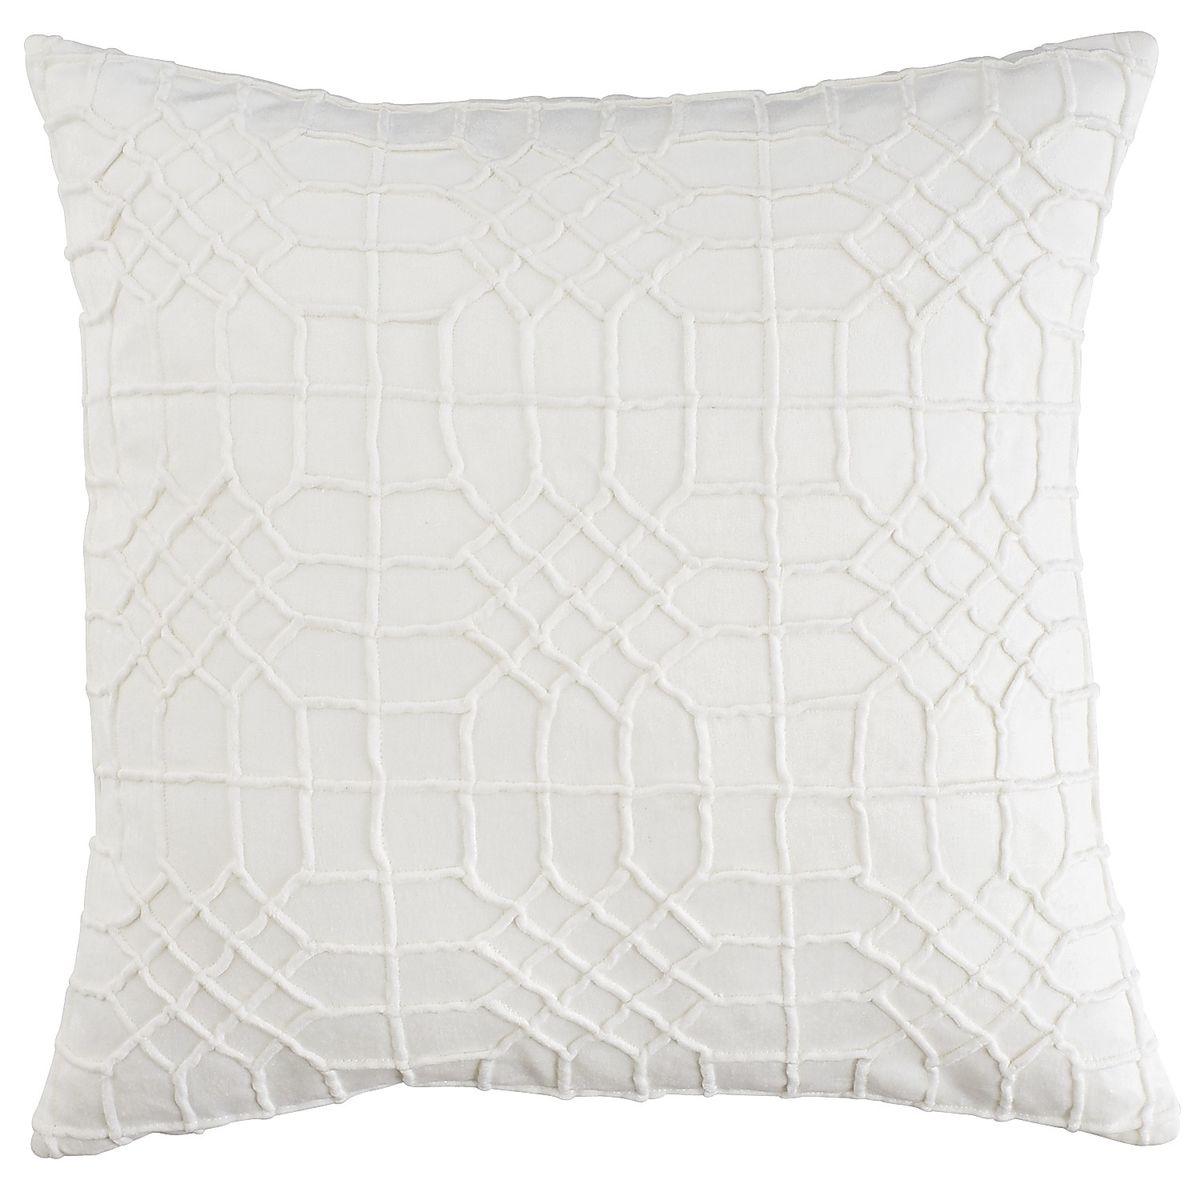 Romantic Glam Beaded Pillow - Copy.jpg